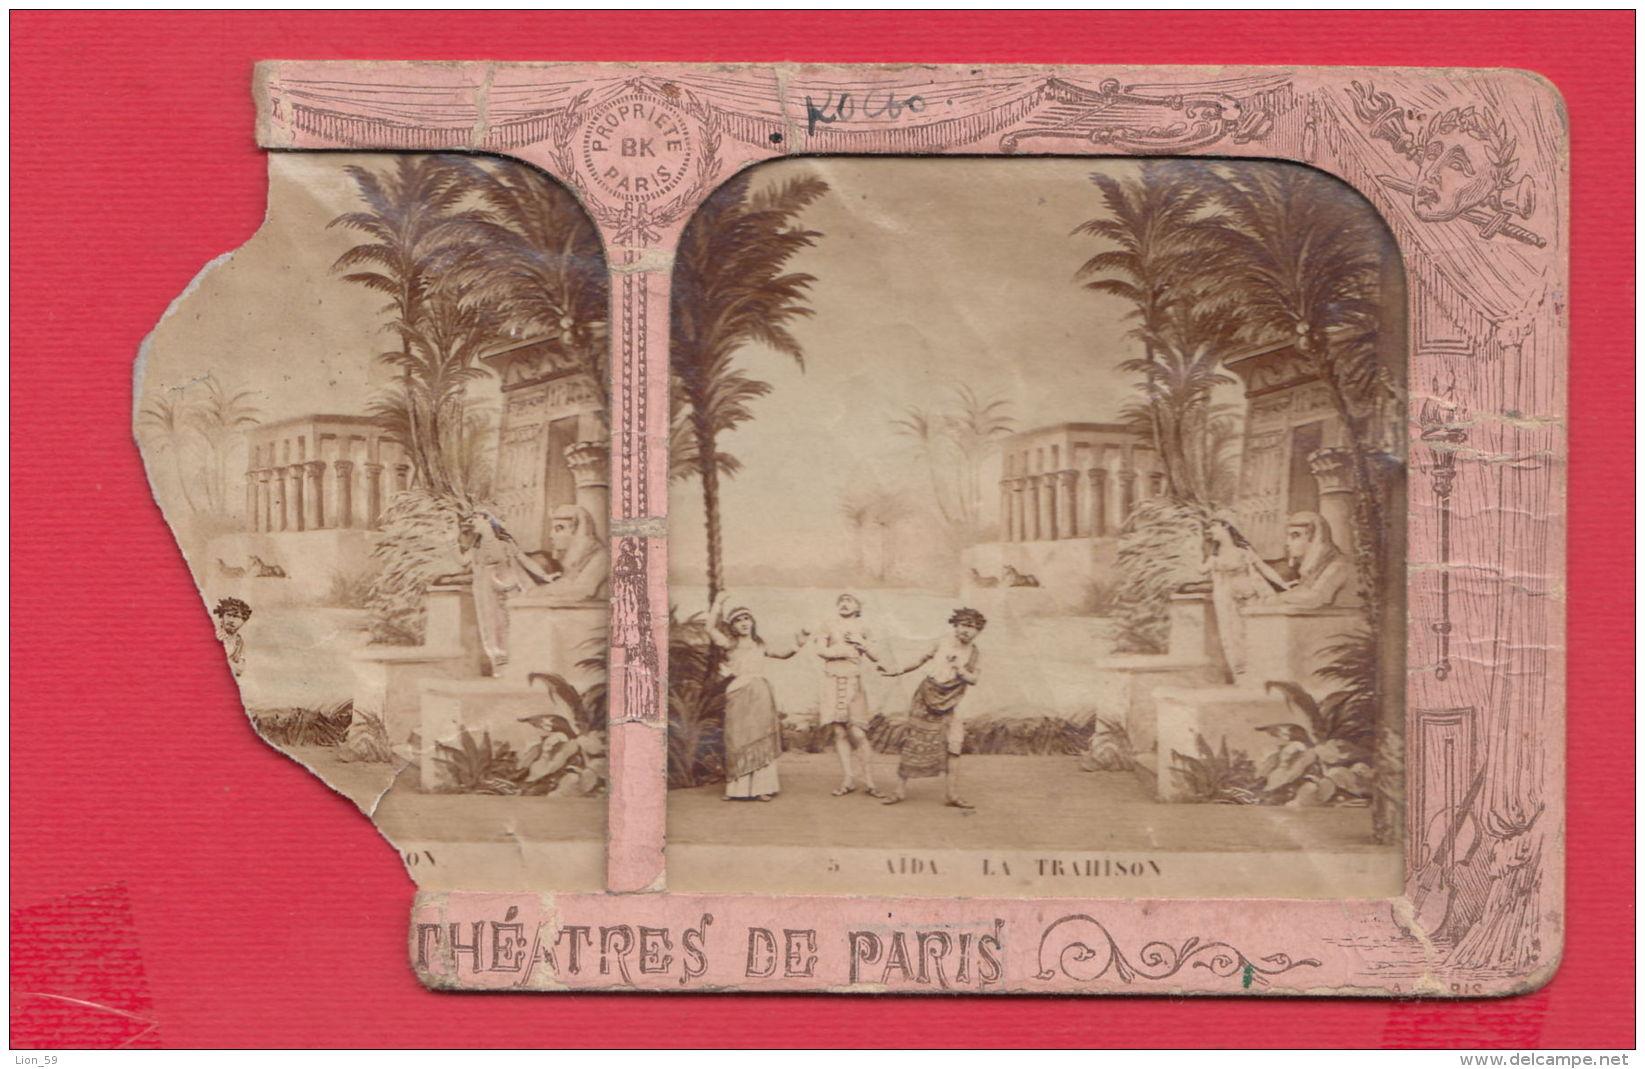 220133 / Old Real Original Photo -  THEATRES DE PARIS , AIDA LA TRAHISON , COLOR , - BK PROPRIETE - Stereoscopi